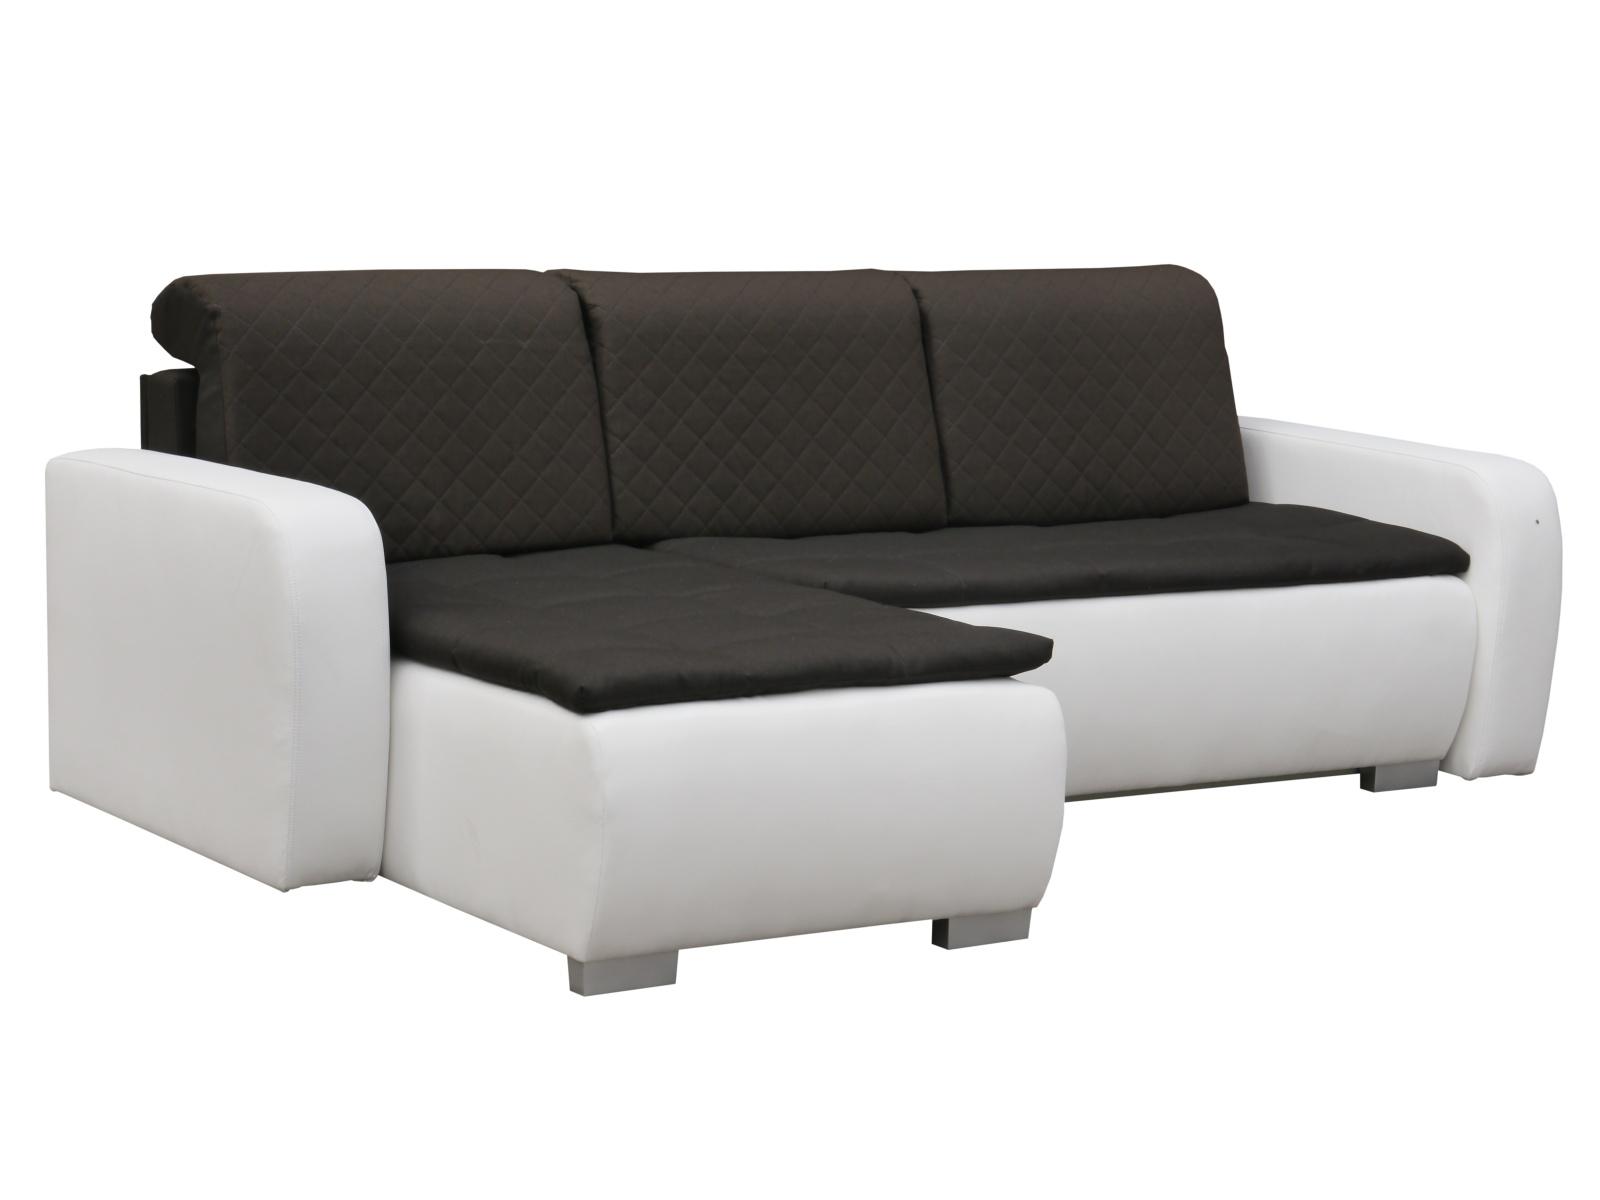 Smartshop Rohová sedačka GRAND 9, levá, hnědá/bílá